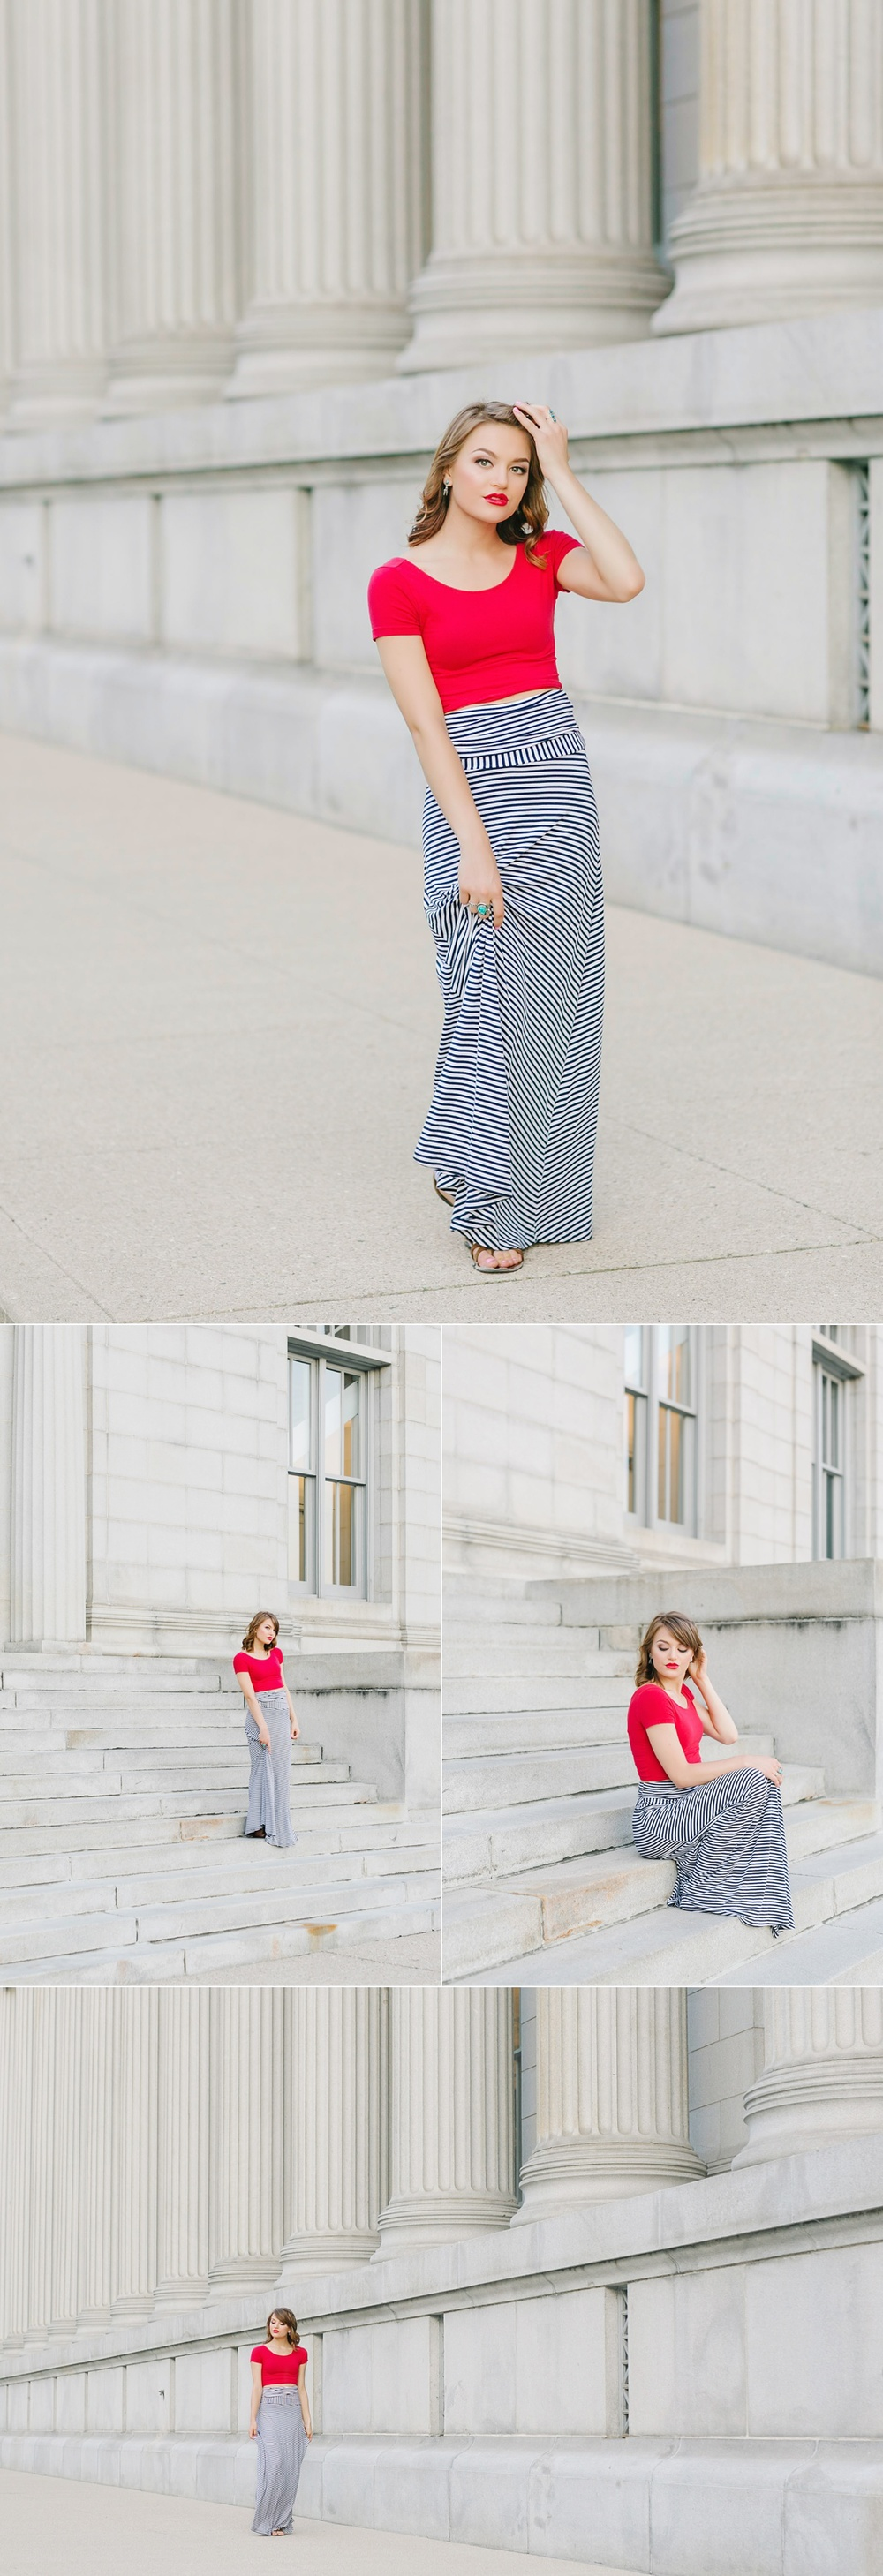 Dayton-Senior-Photography-Lux-Senior-Photography-06.jpg